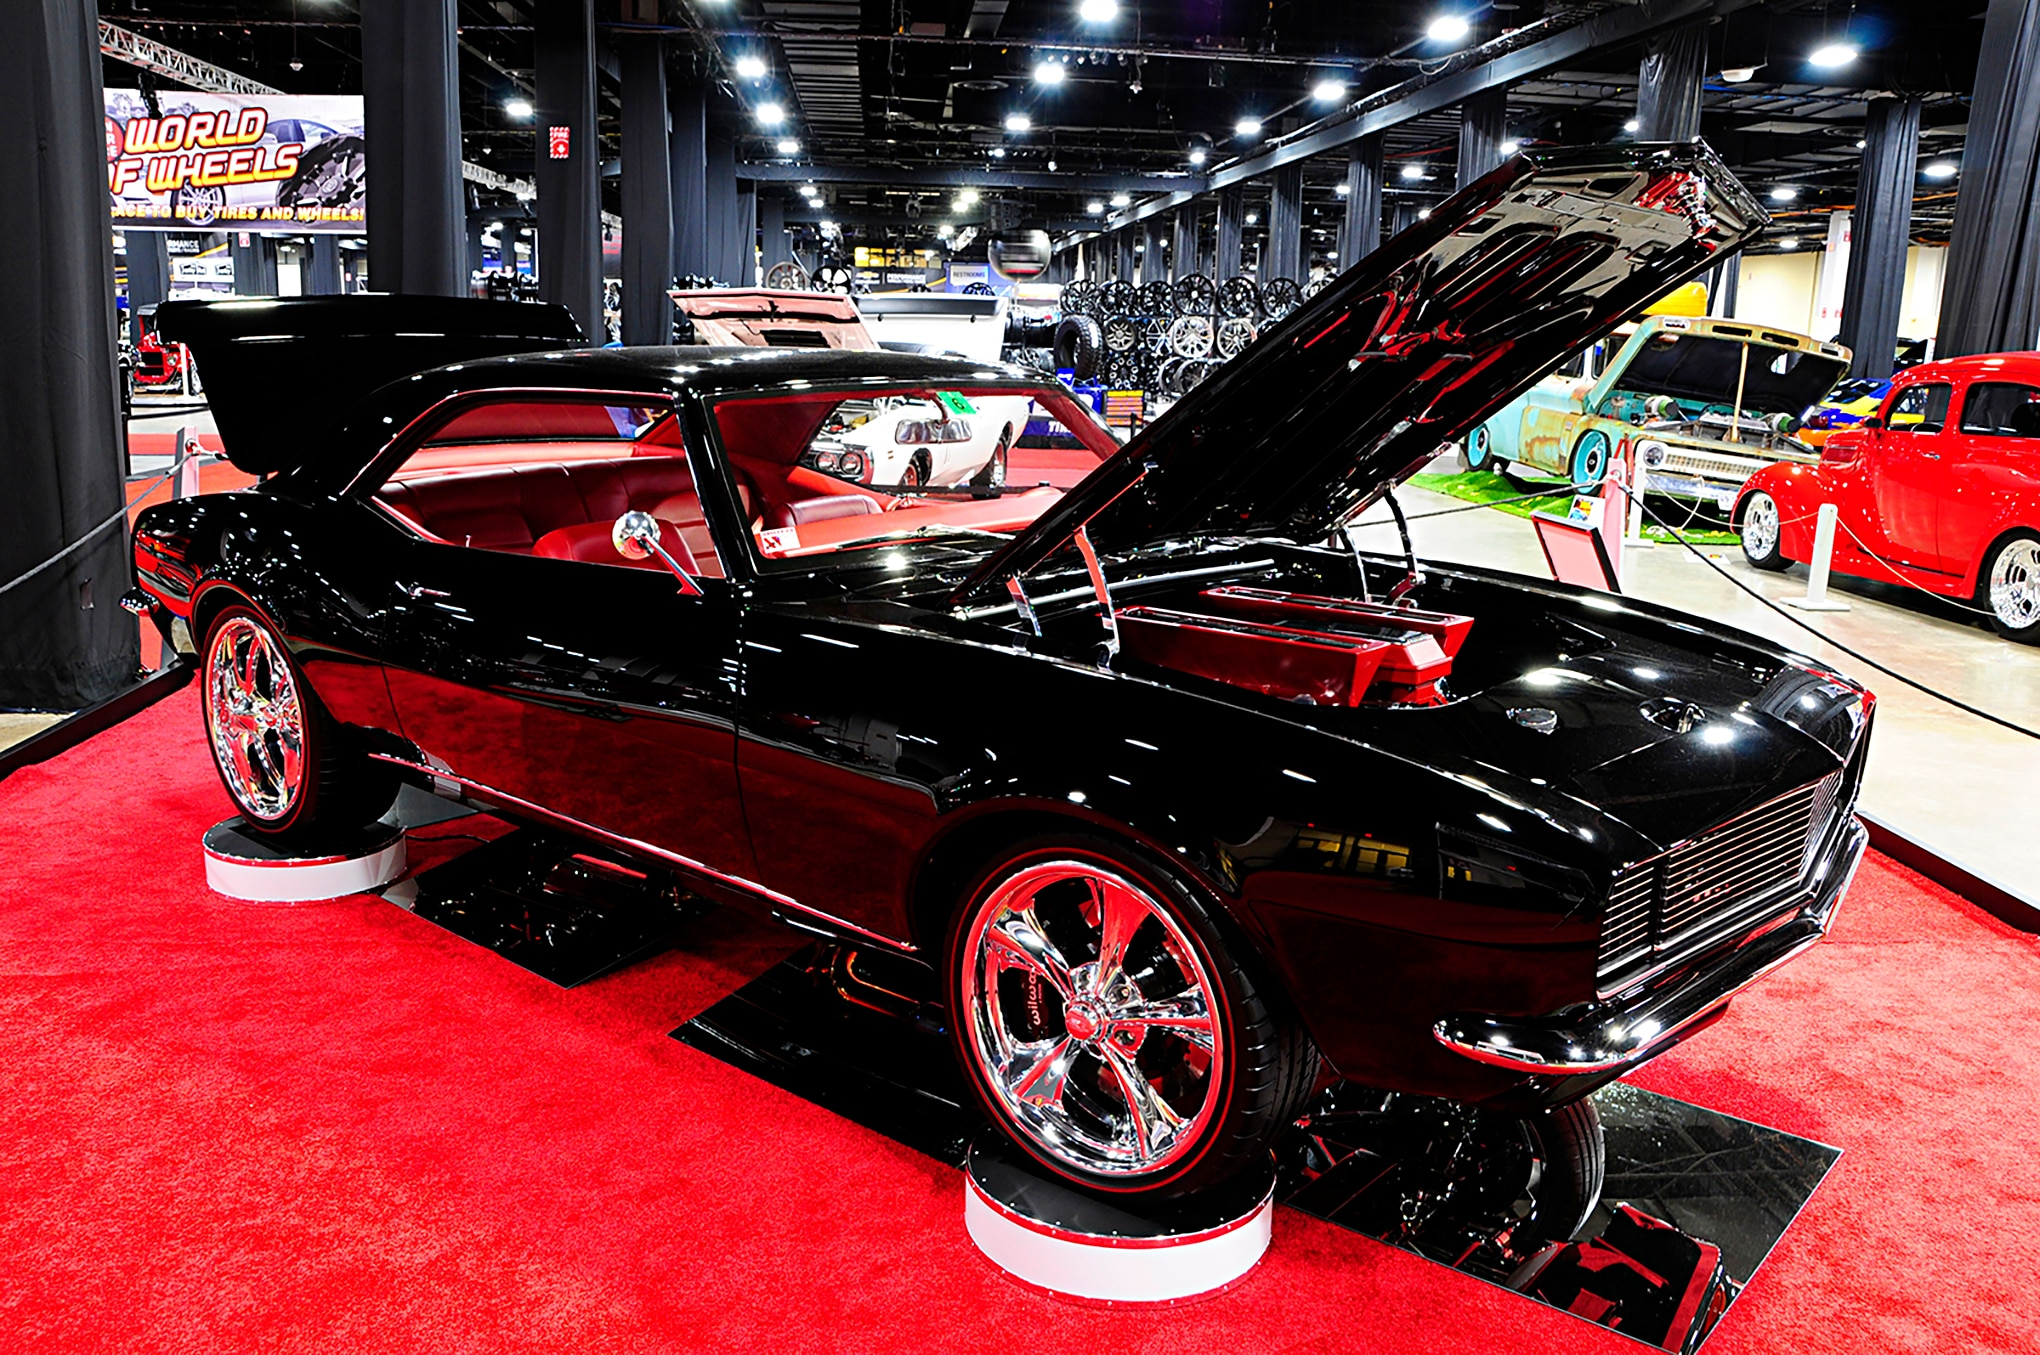 Th Annual Town Fair Tire Boston World Of Wheels Automobile Magazine - World of wheels car show boston